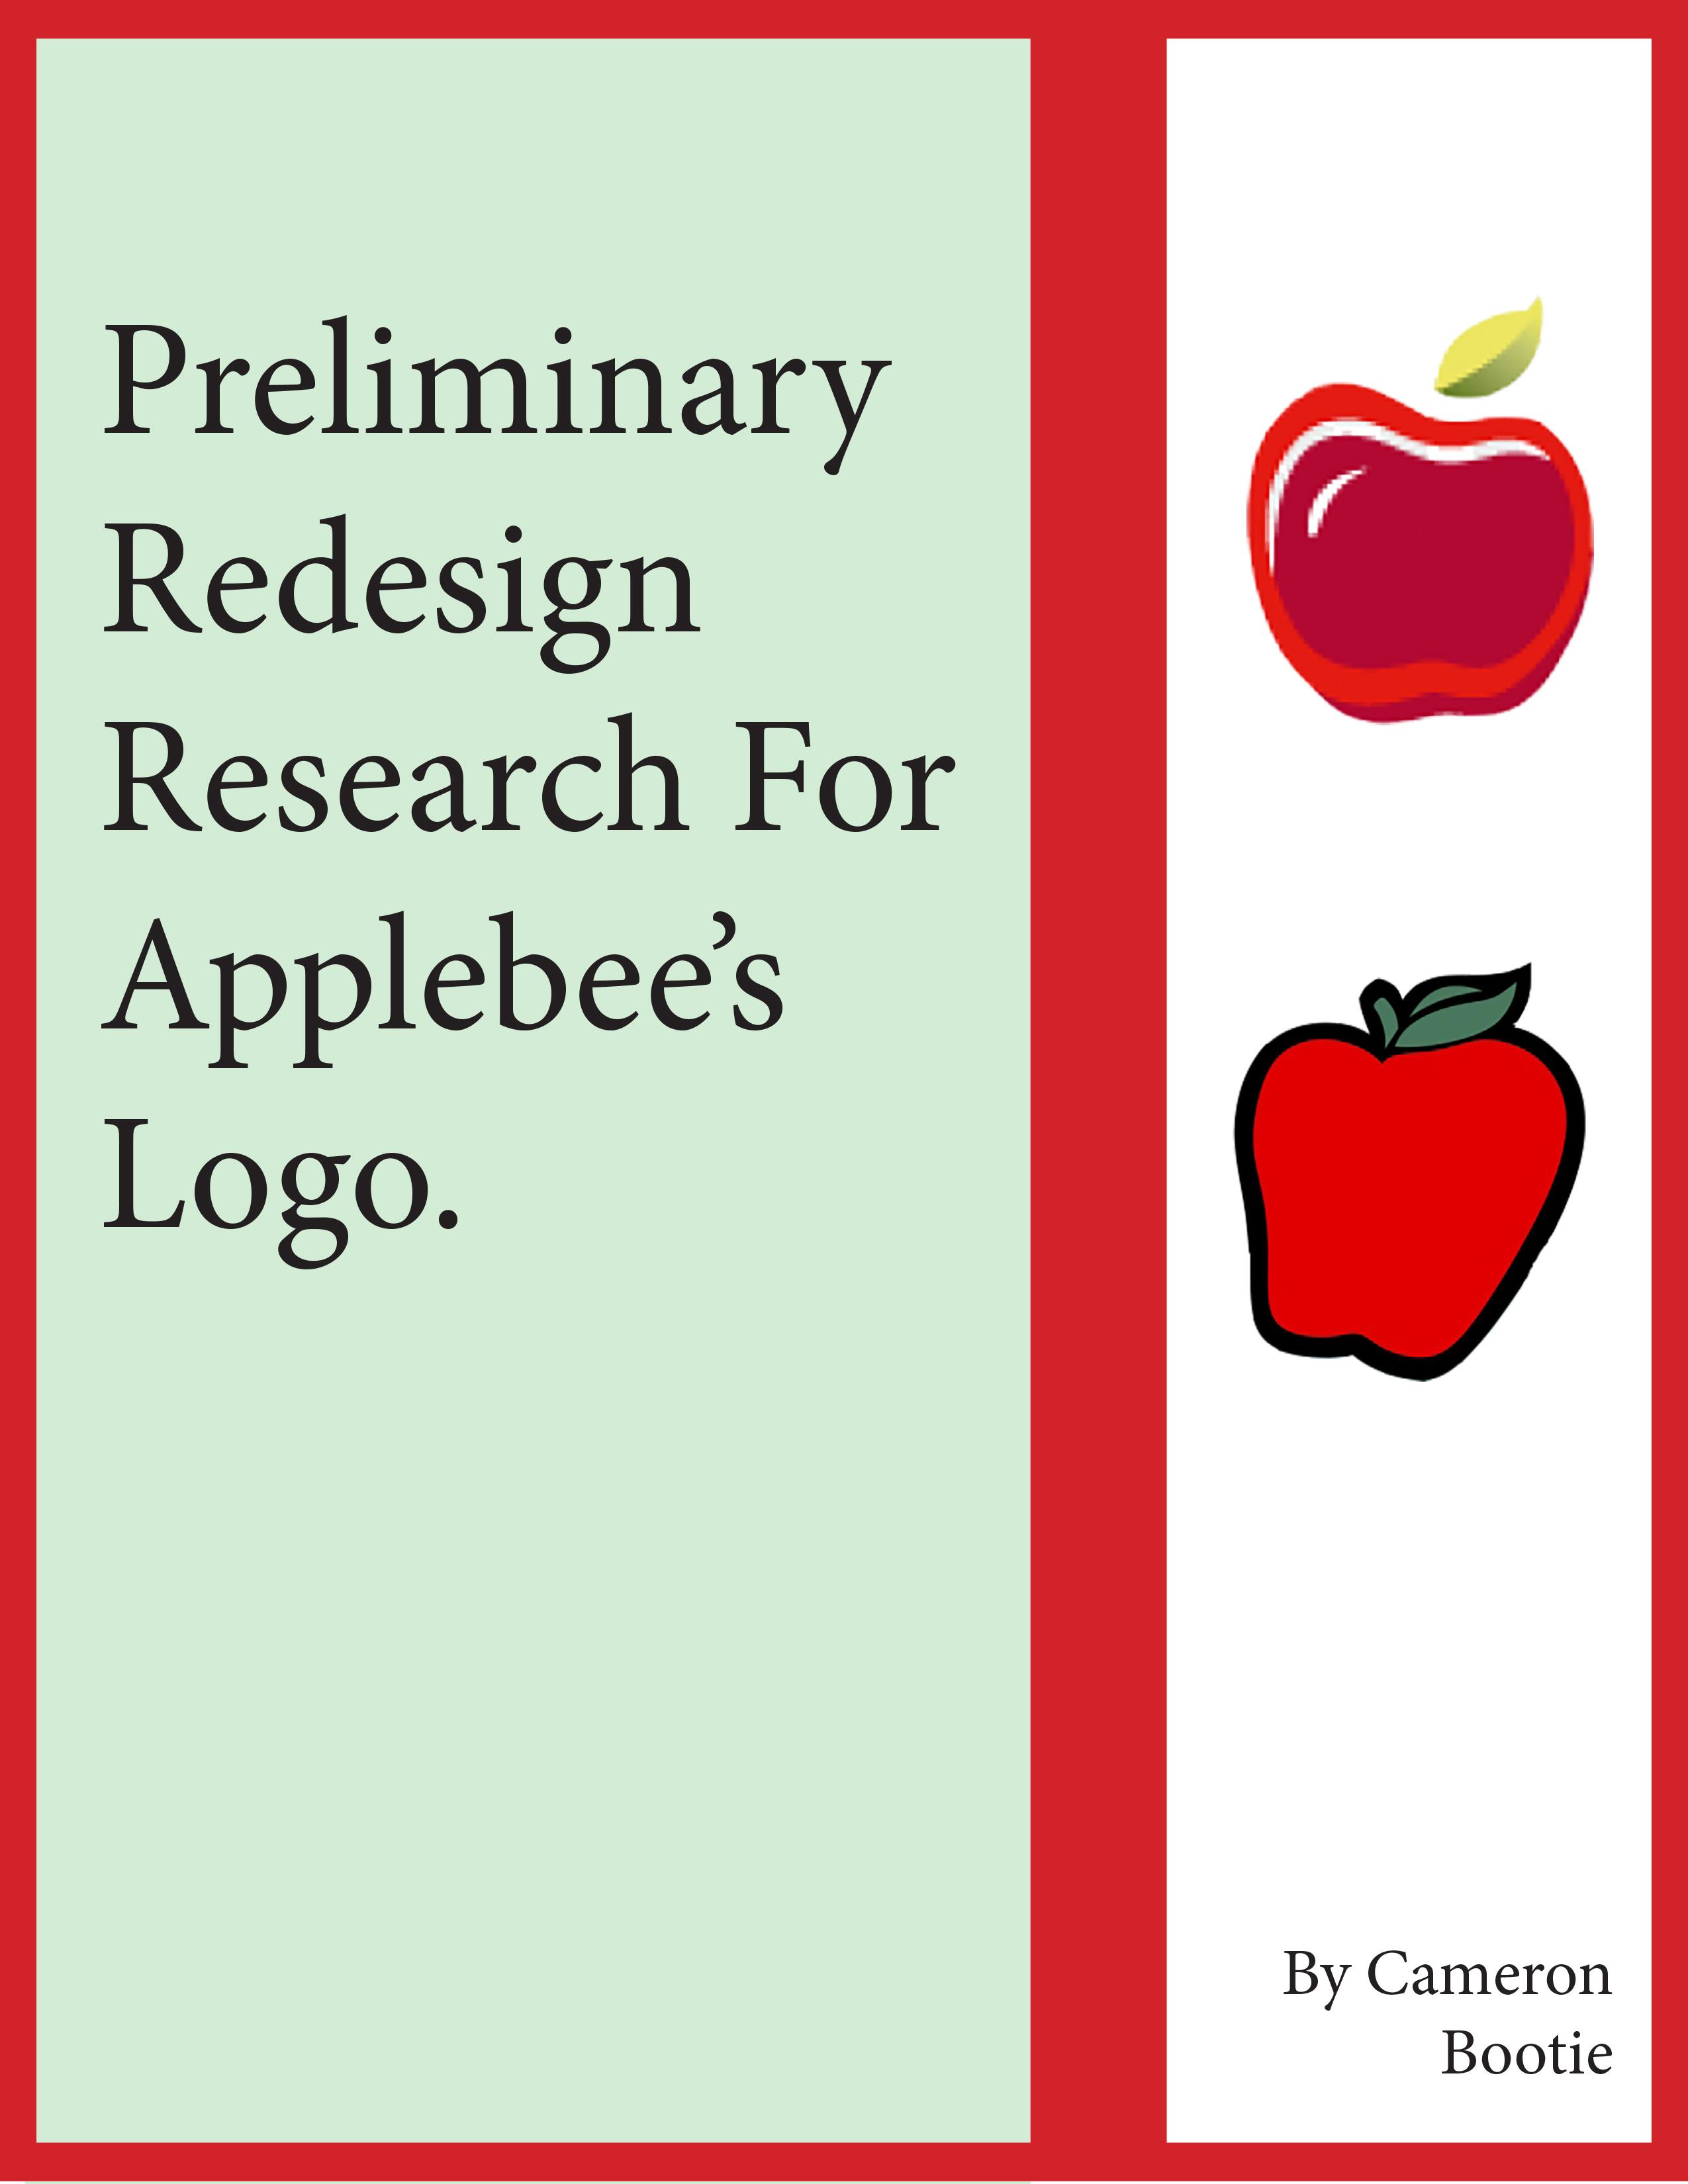 Applbee's Redesign Document Print-1